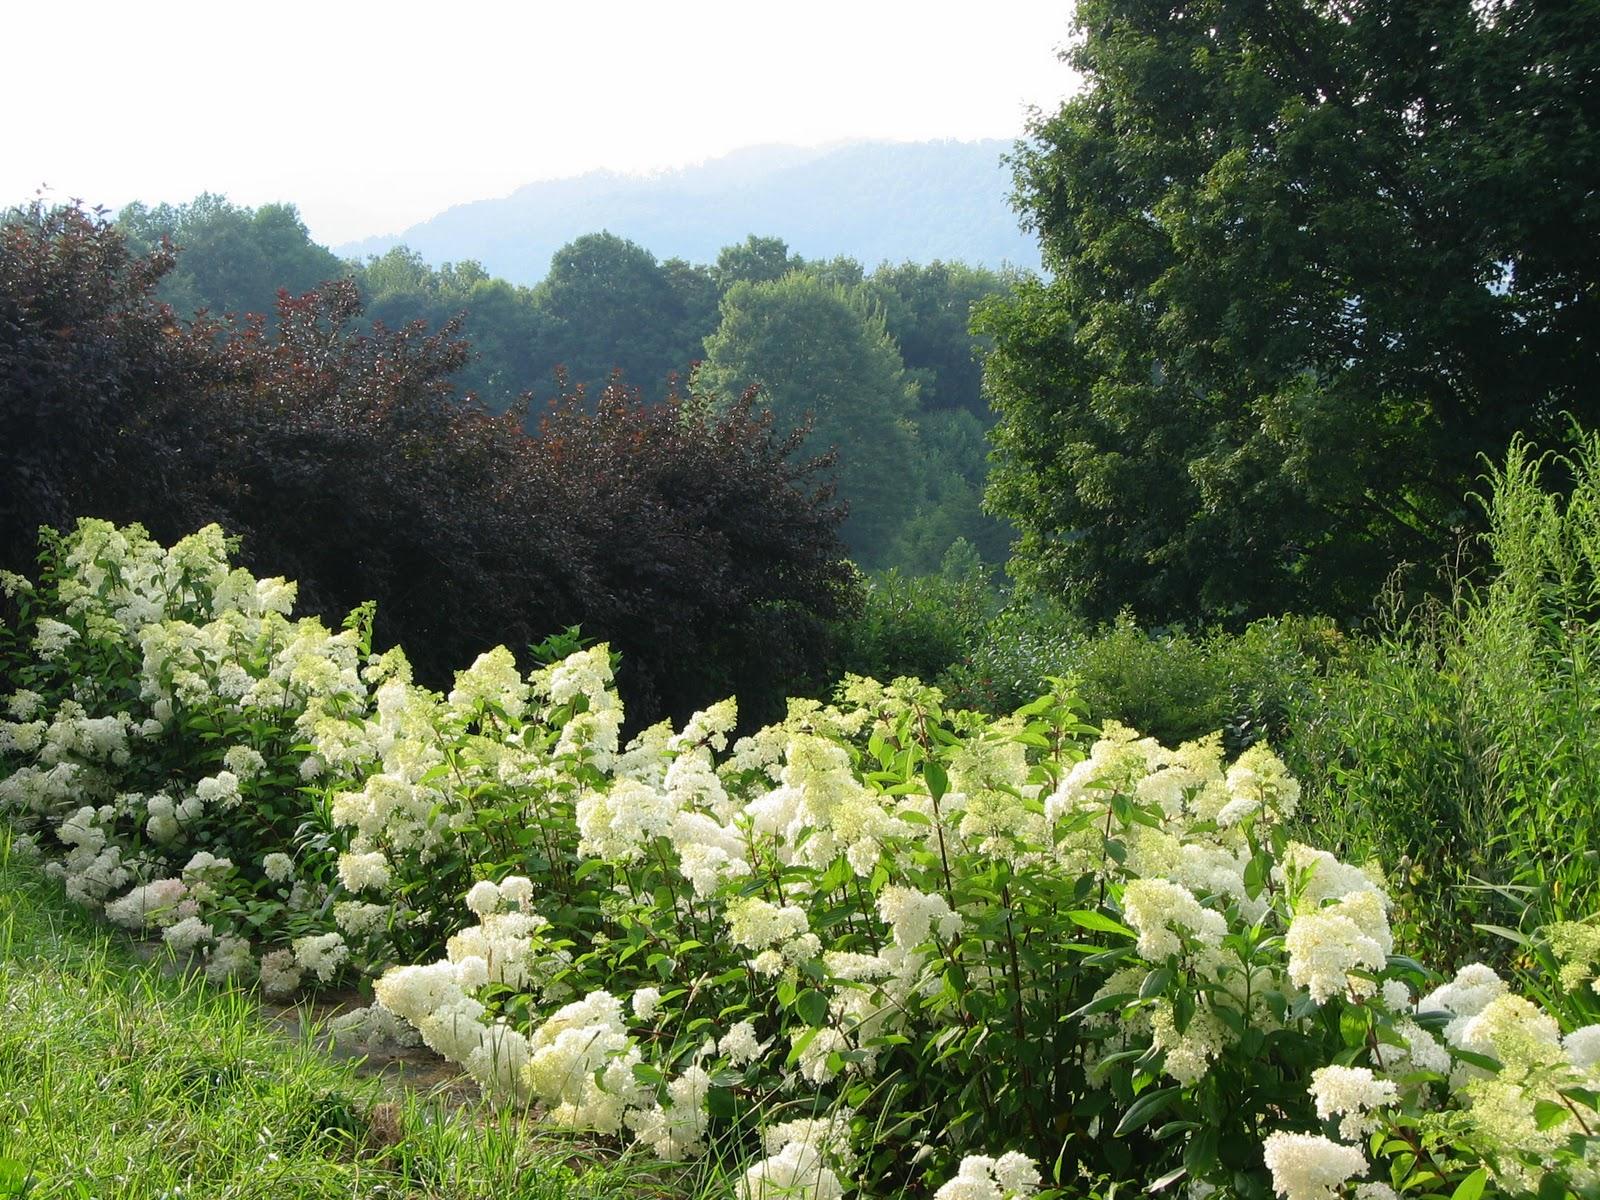 Physostegia Virginiana Crystal Peak White